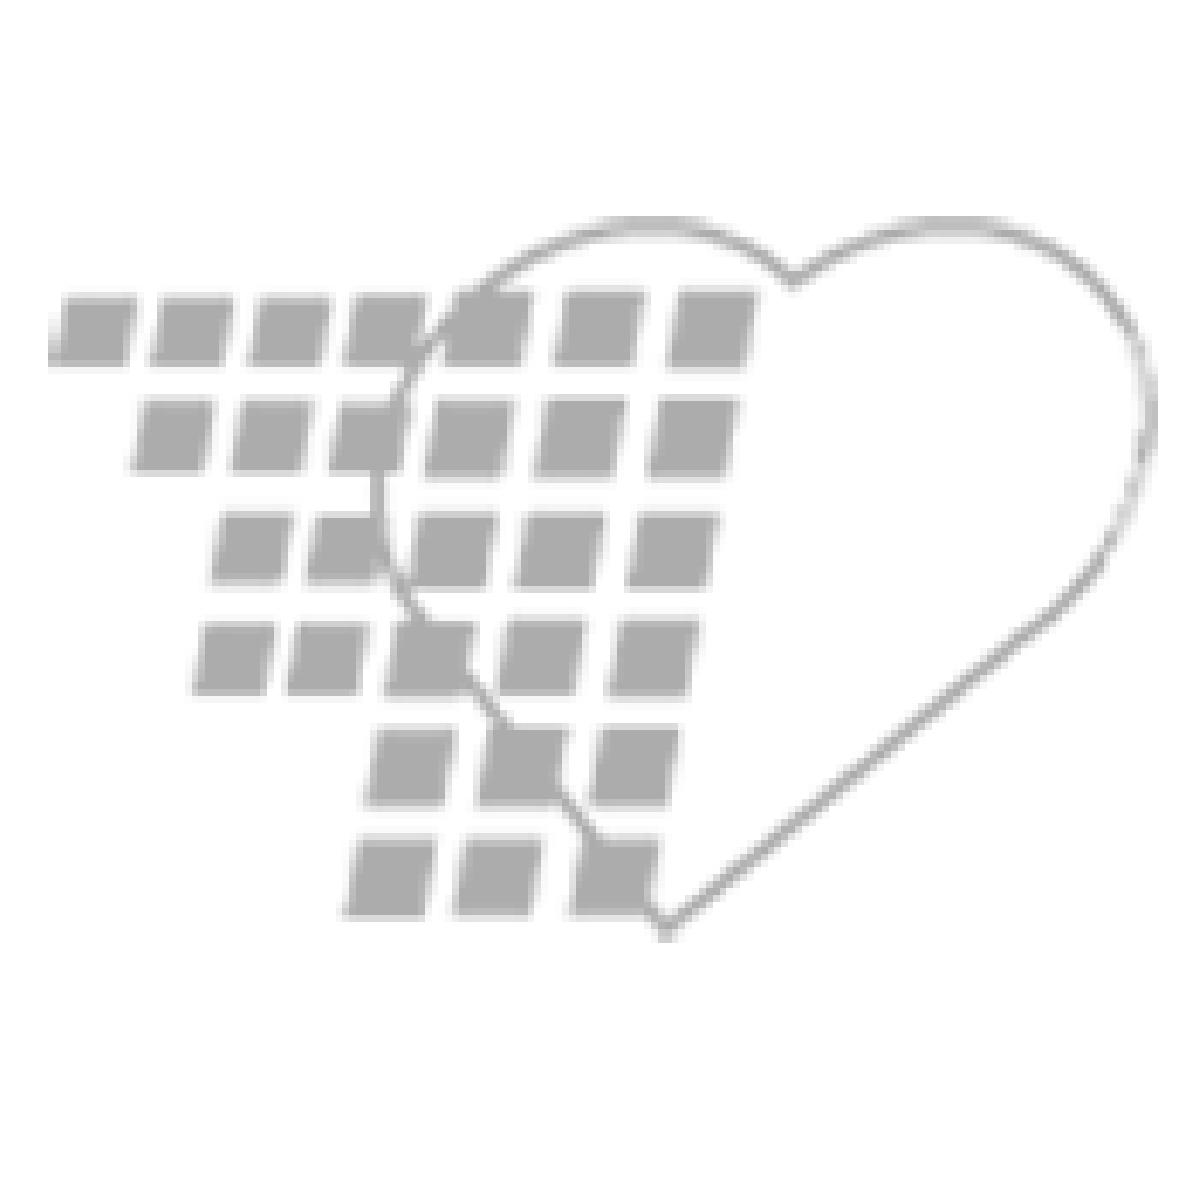 11-81-0003-BRNSM - SimLeggings® - Small Brown